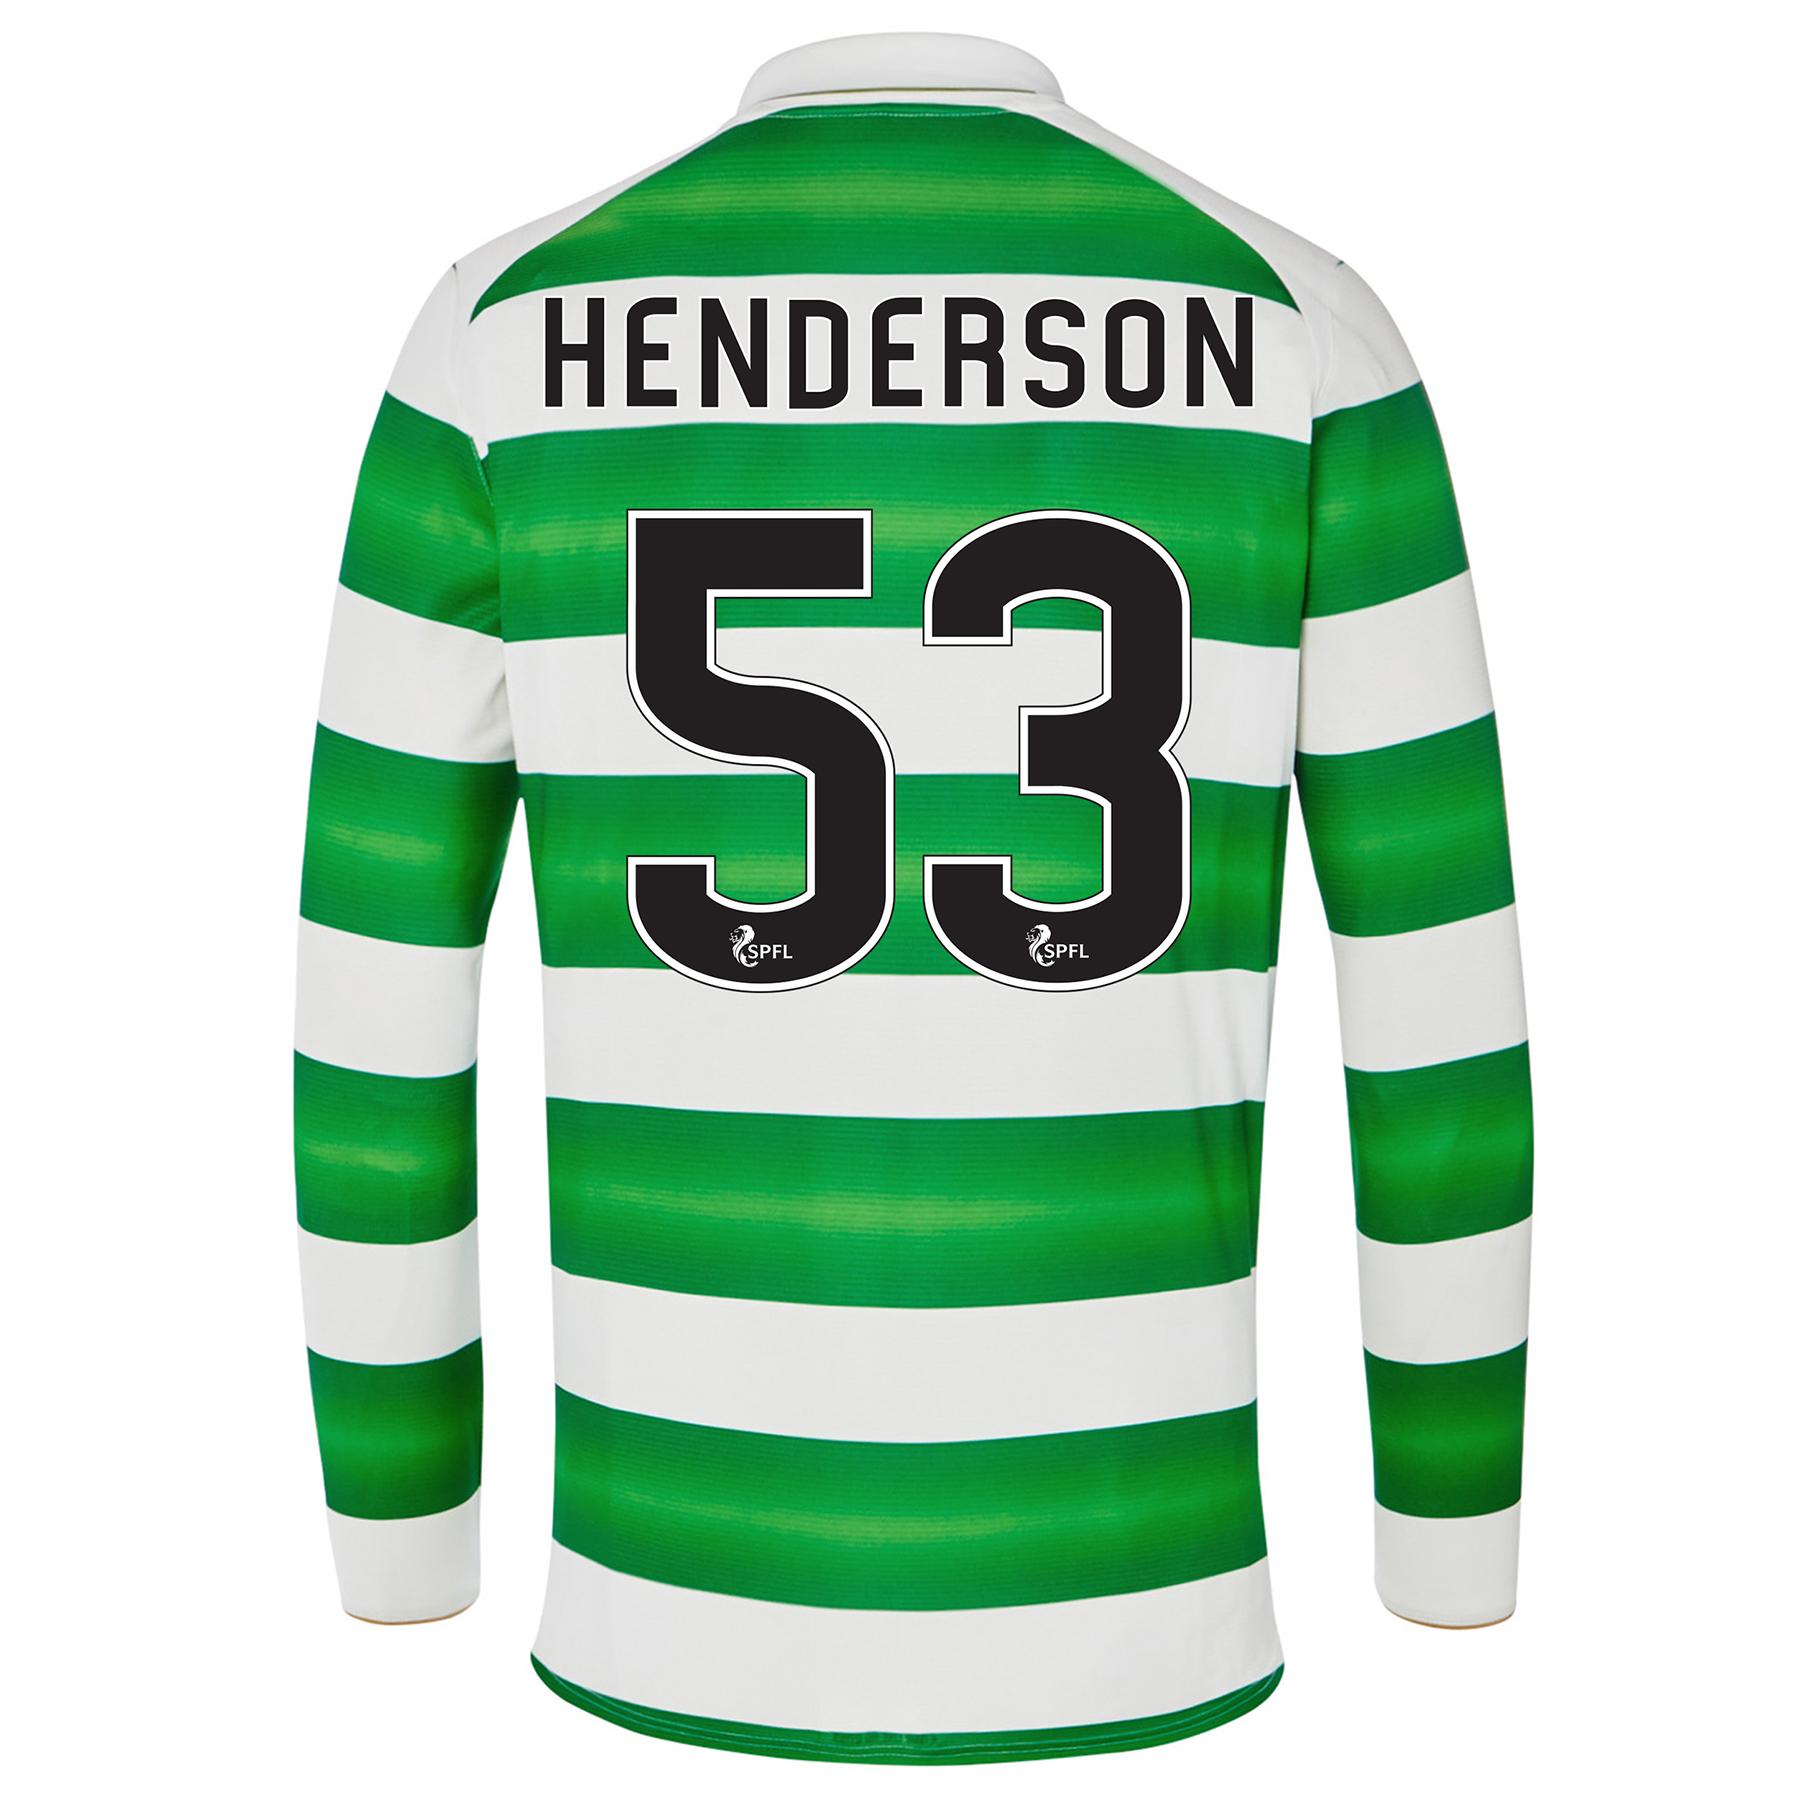 Celtic Home Kids Shirt 2016-17 - Long Sleeve with Henderson 53 printin